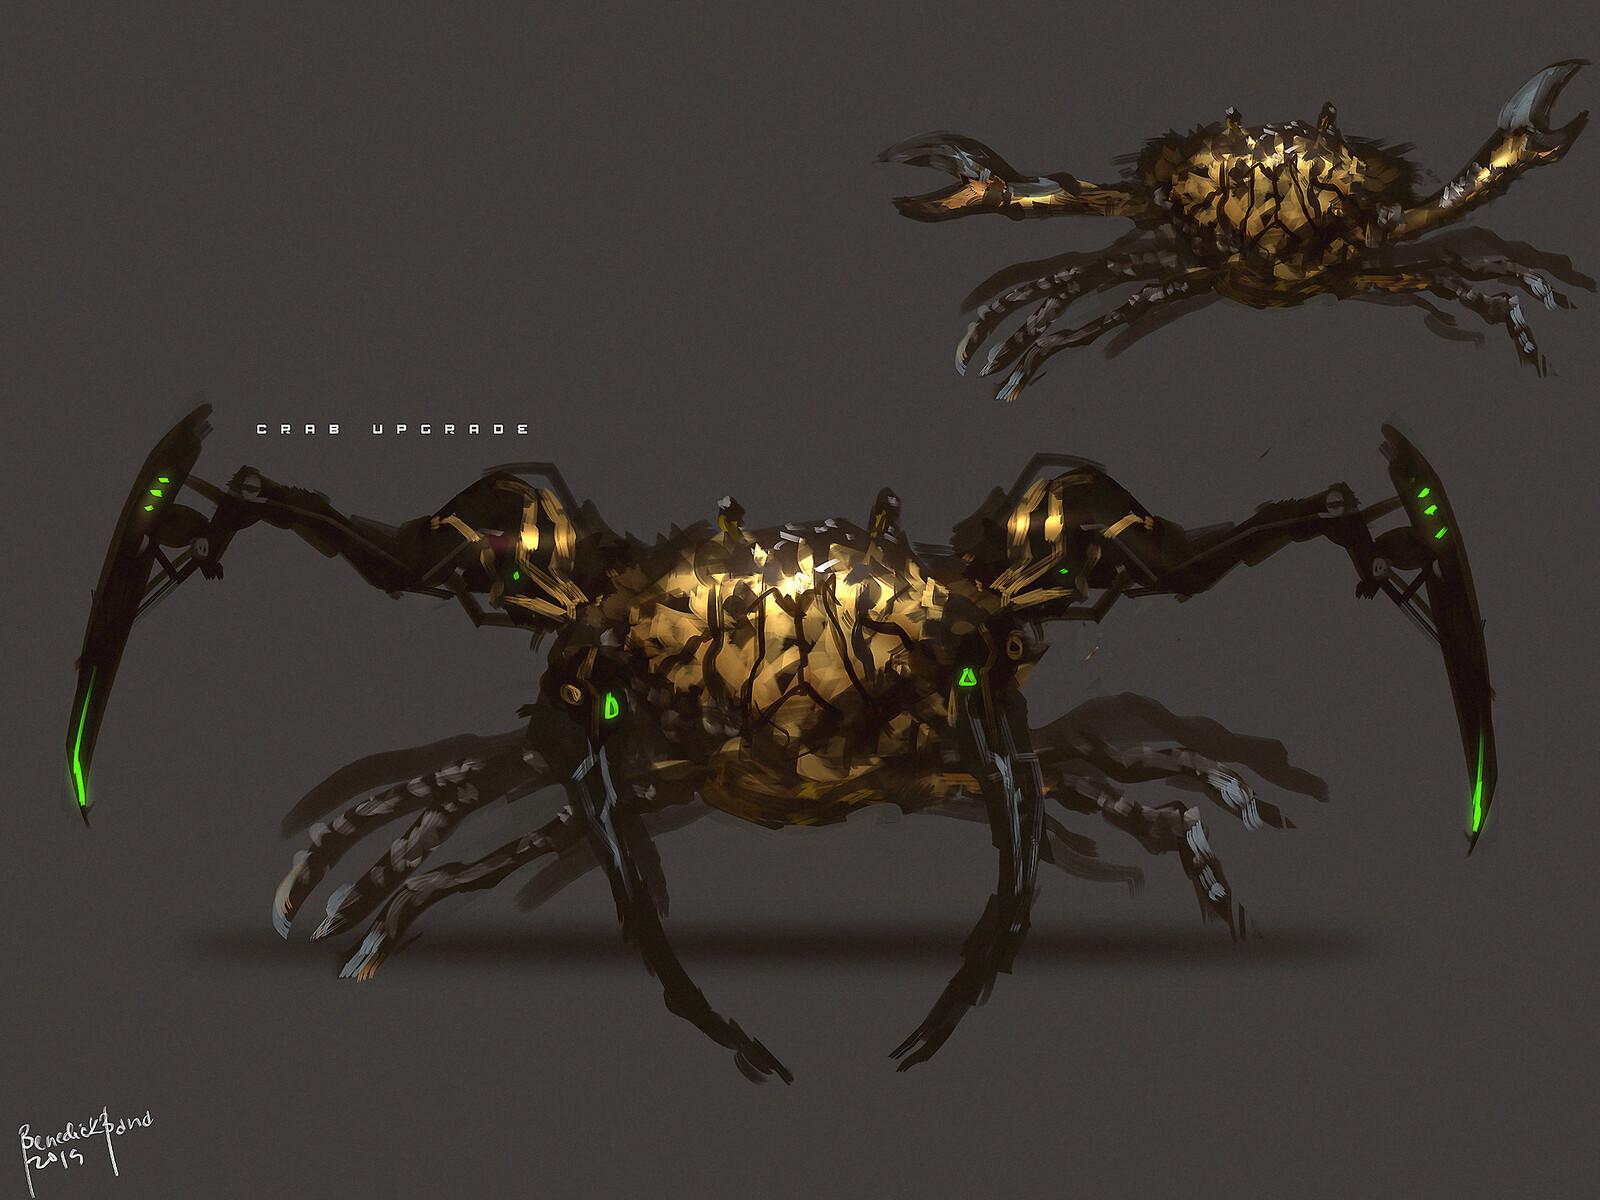 Crab Upgrade